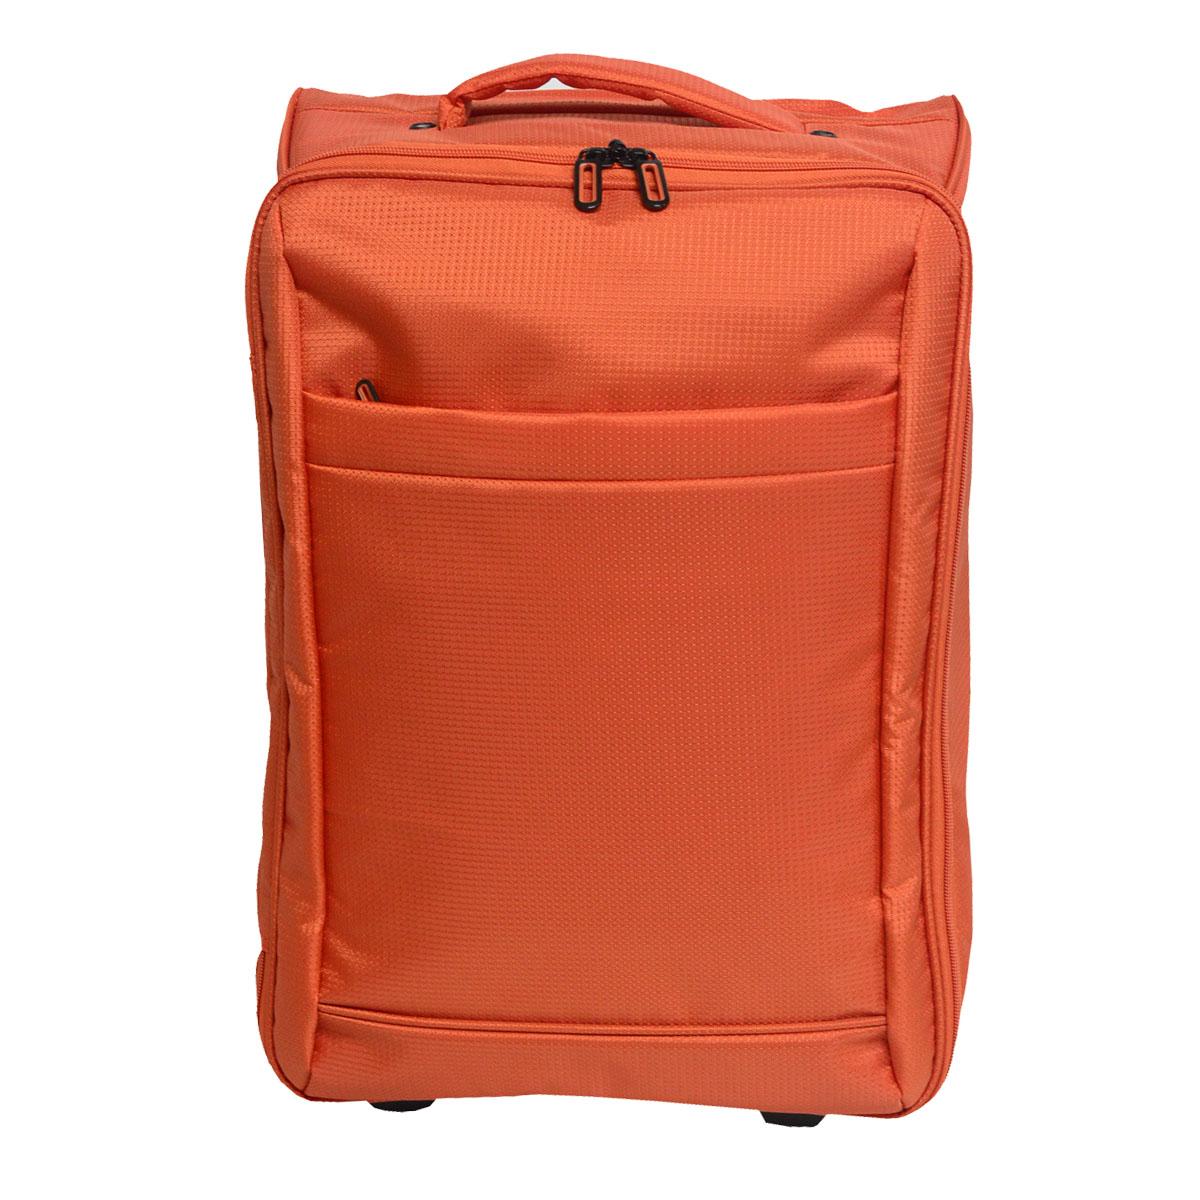 2 Wheels Foldway Suitcase